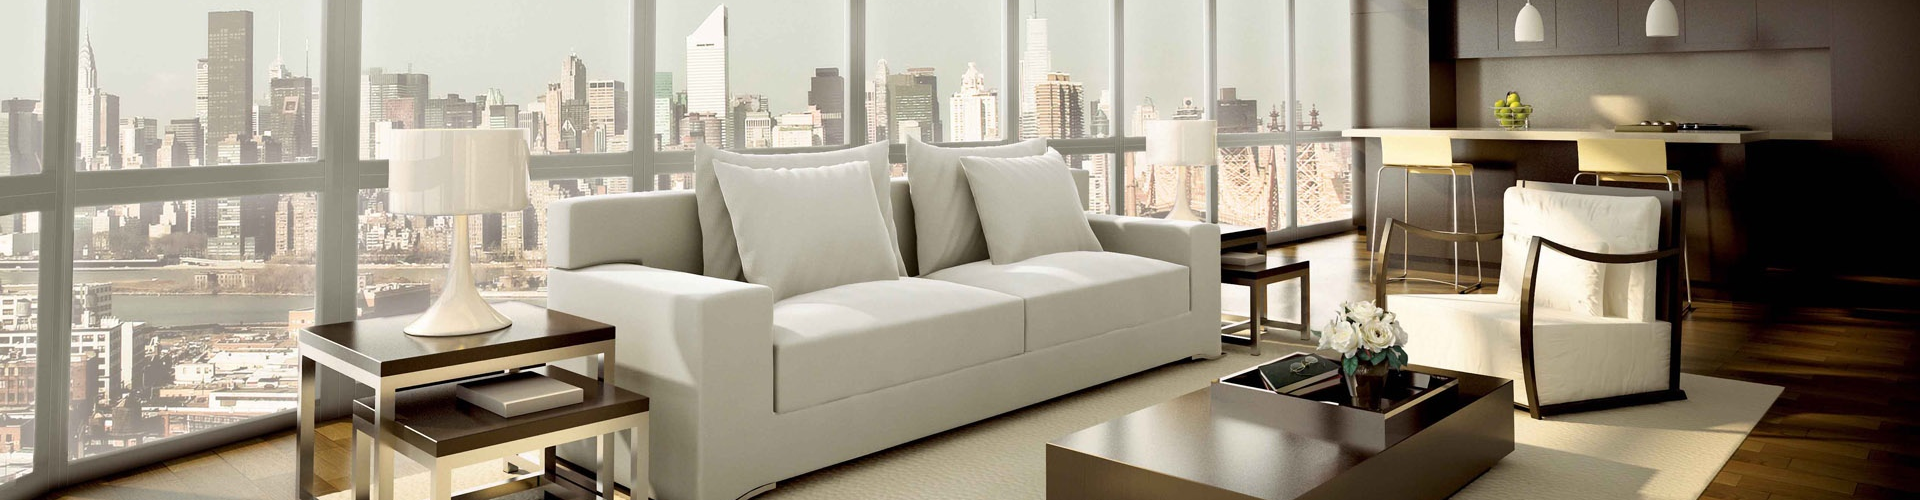 мебель готовая и на заказ